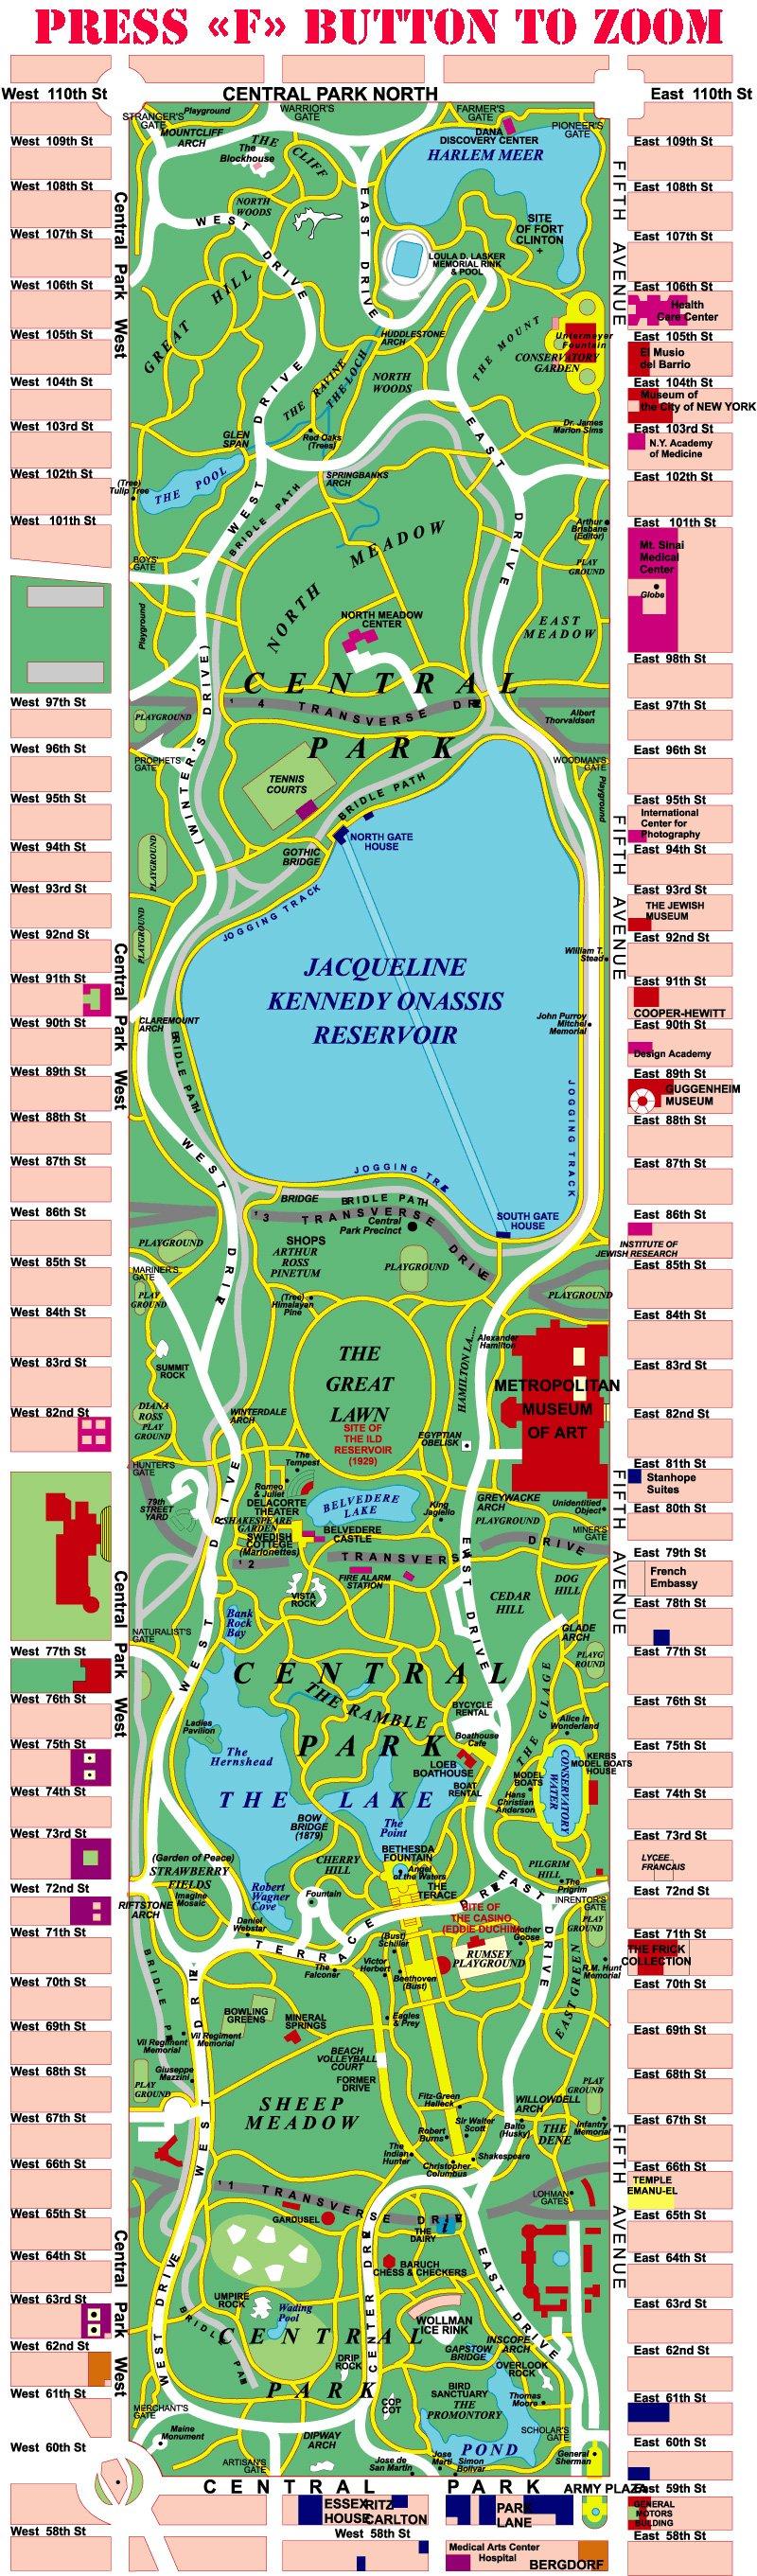 Nyc Subway Map Metropolitan Museum.New York City Central Park The Metropolitan Museum Hayden Planetarium